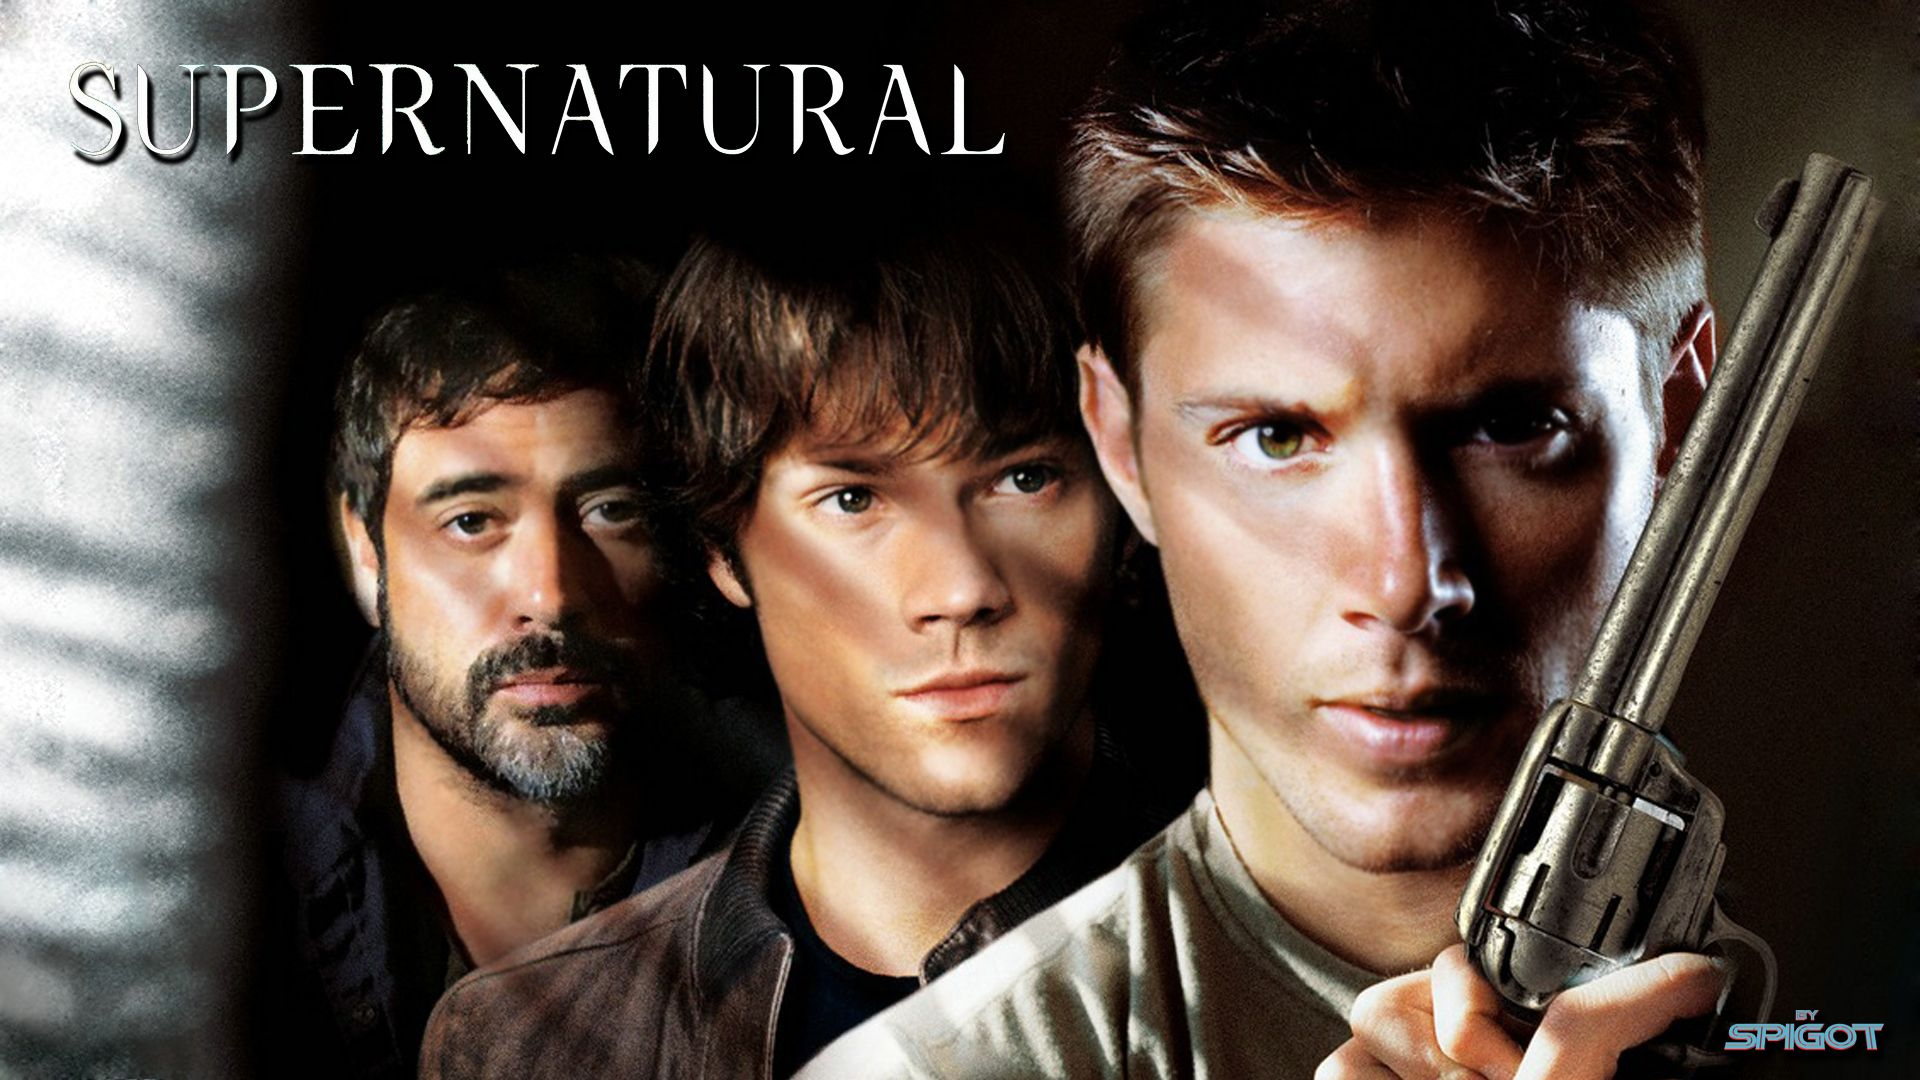 supernaturaldesktopwallpapershd1920x1080colt.jpg